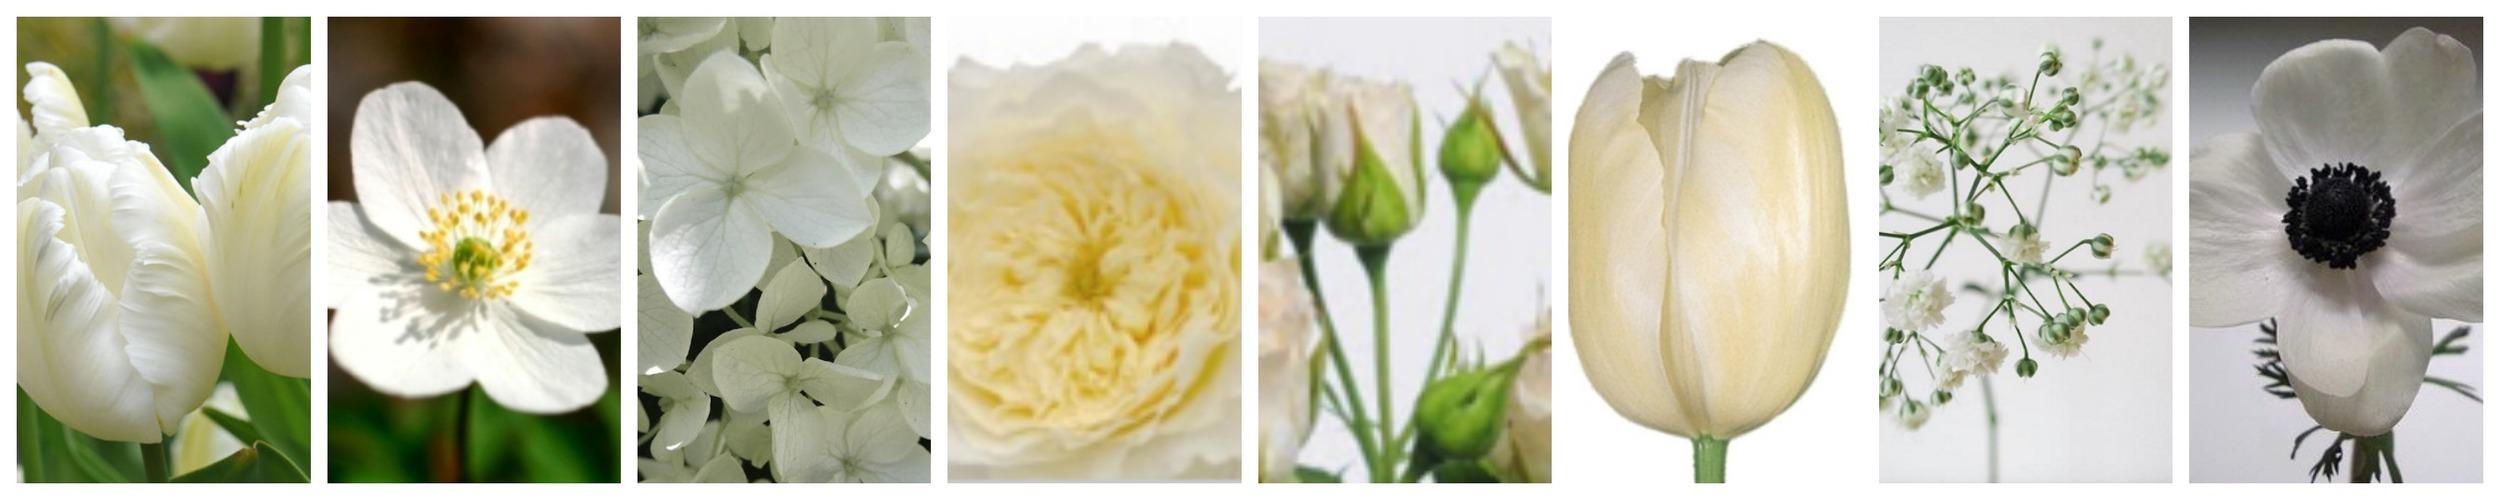 White Flower Mix Wedding Floral Design Blog NZ Tulip Hydrangea Poppy Babies Breath Why Flowers Expensive Table Flower